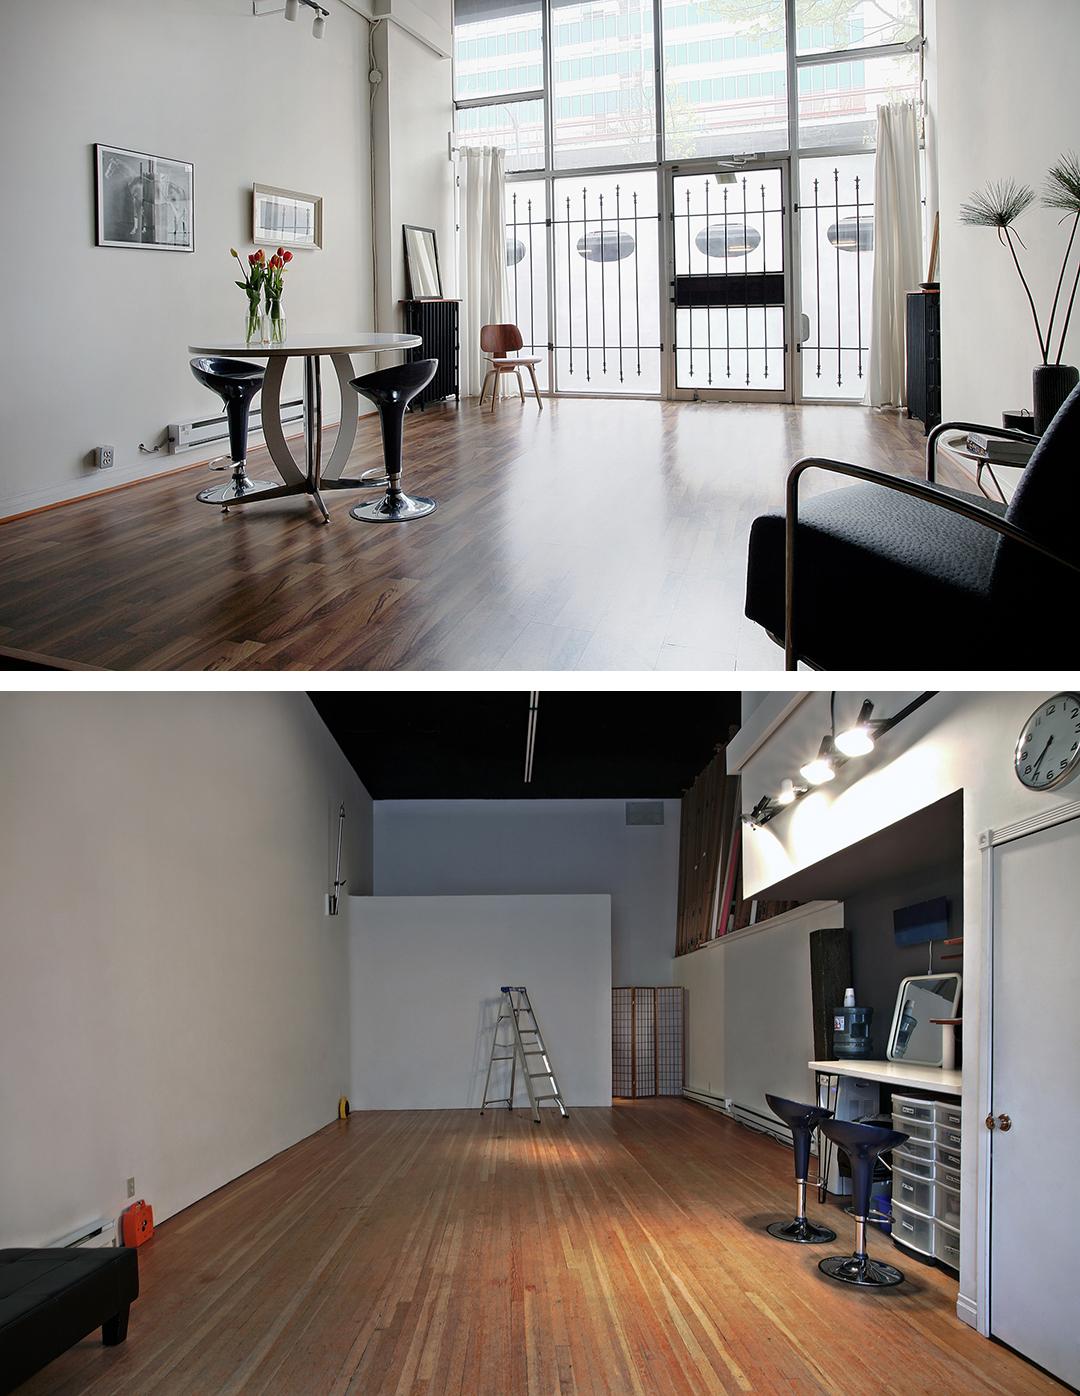 Top: Studio Lobby / Art Gallery | Bottom: Studio Space (800-950 sq. ft.)